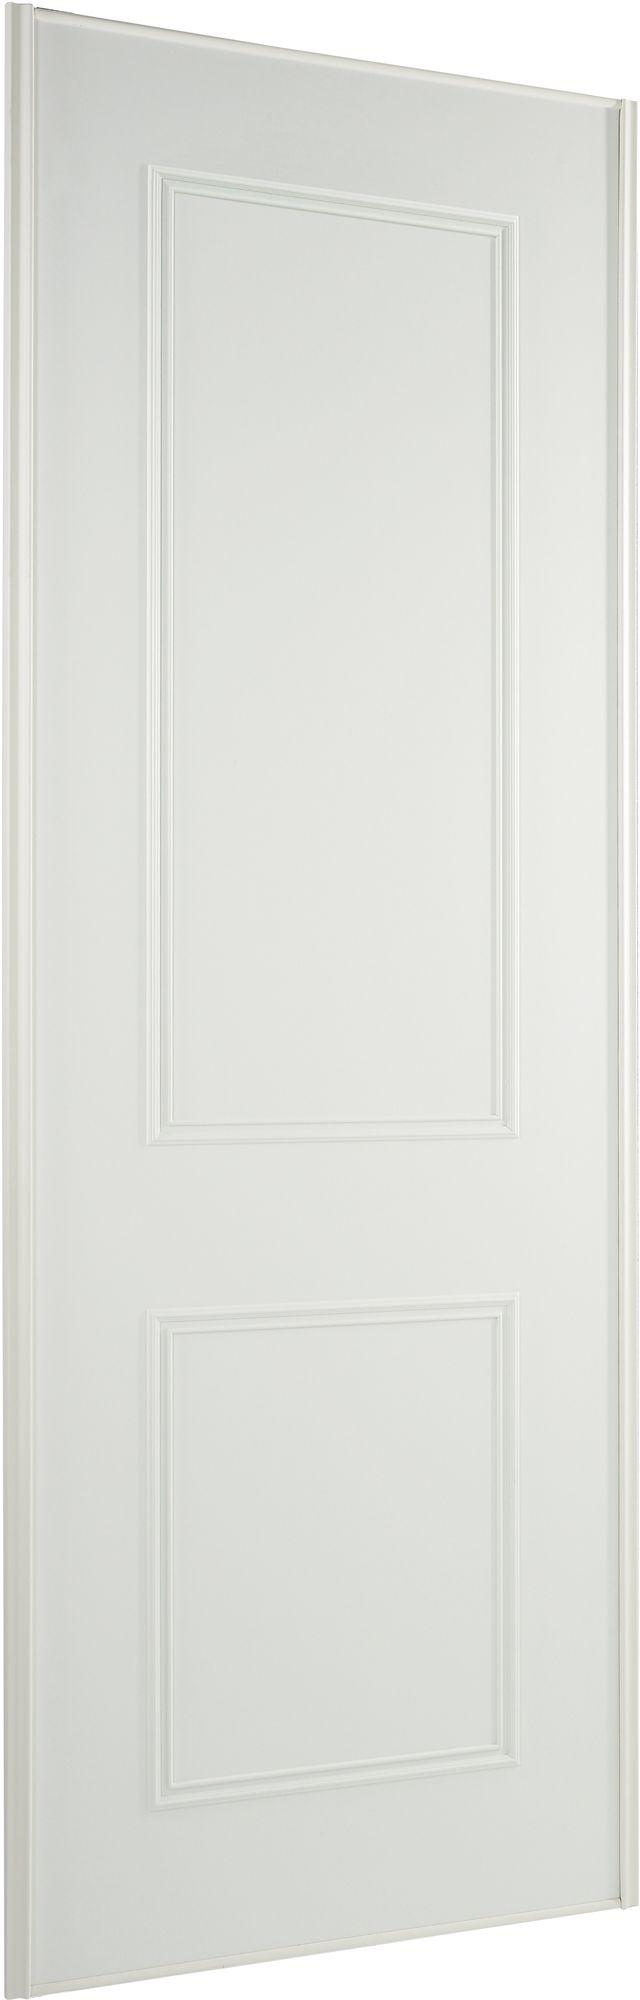 Panel White Sliding Wardrobe Door H2220 Mm W762 Mm Departments